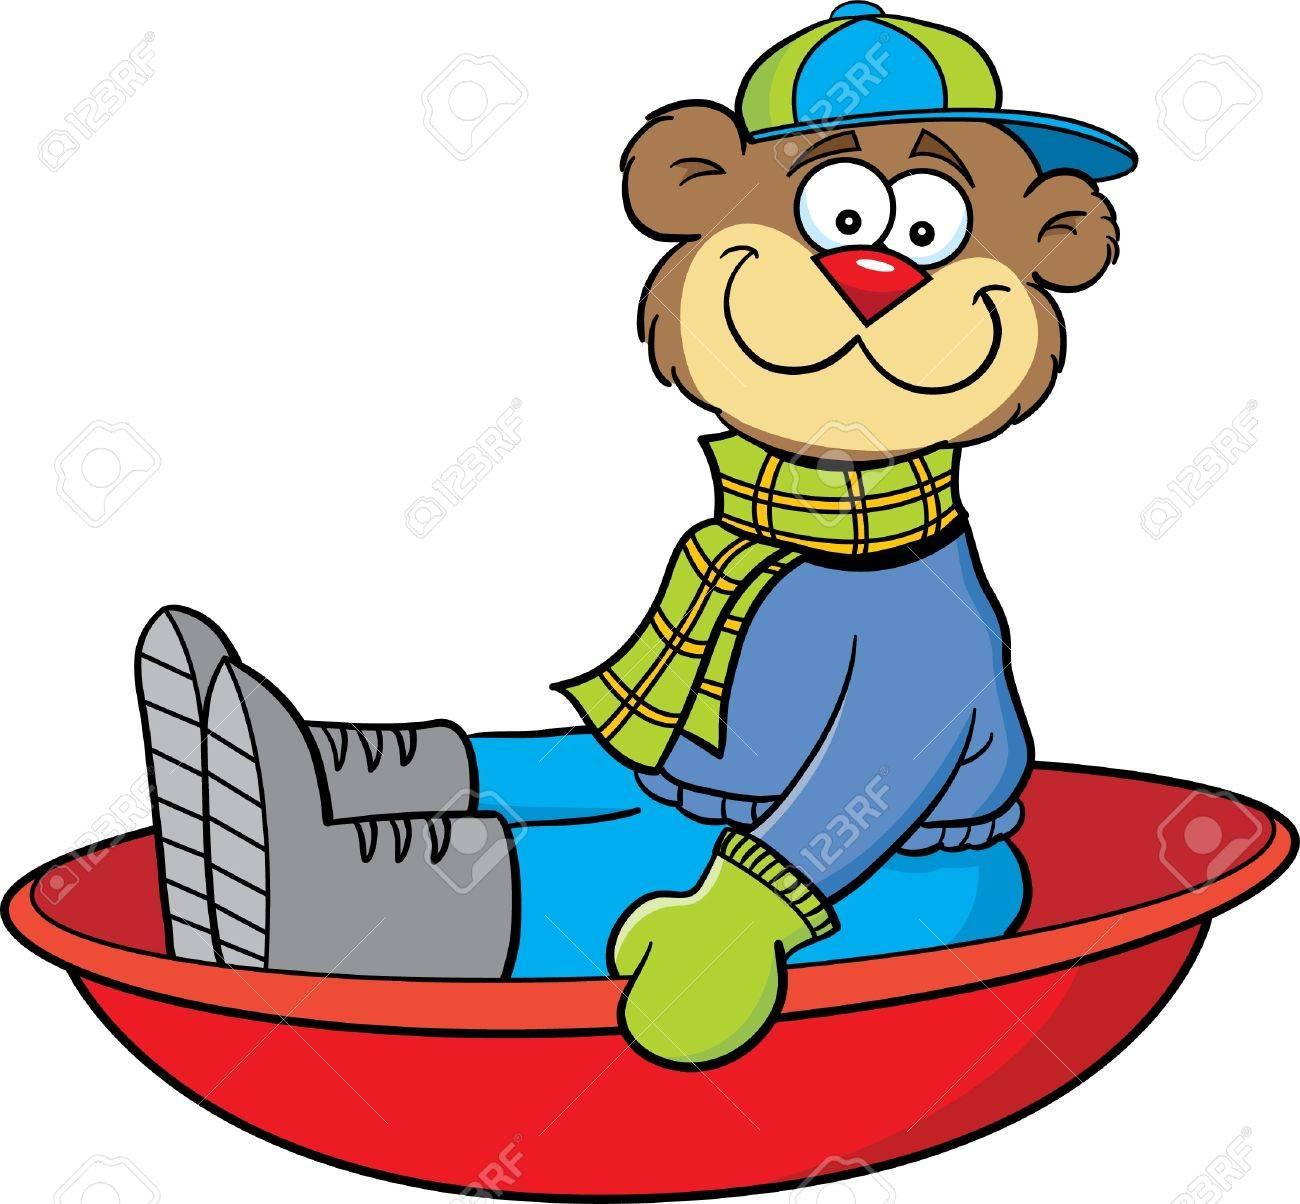 Cartoon Illustration Of A Bear Sledding Royalty Free Cliparts ...